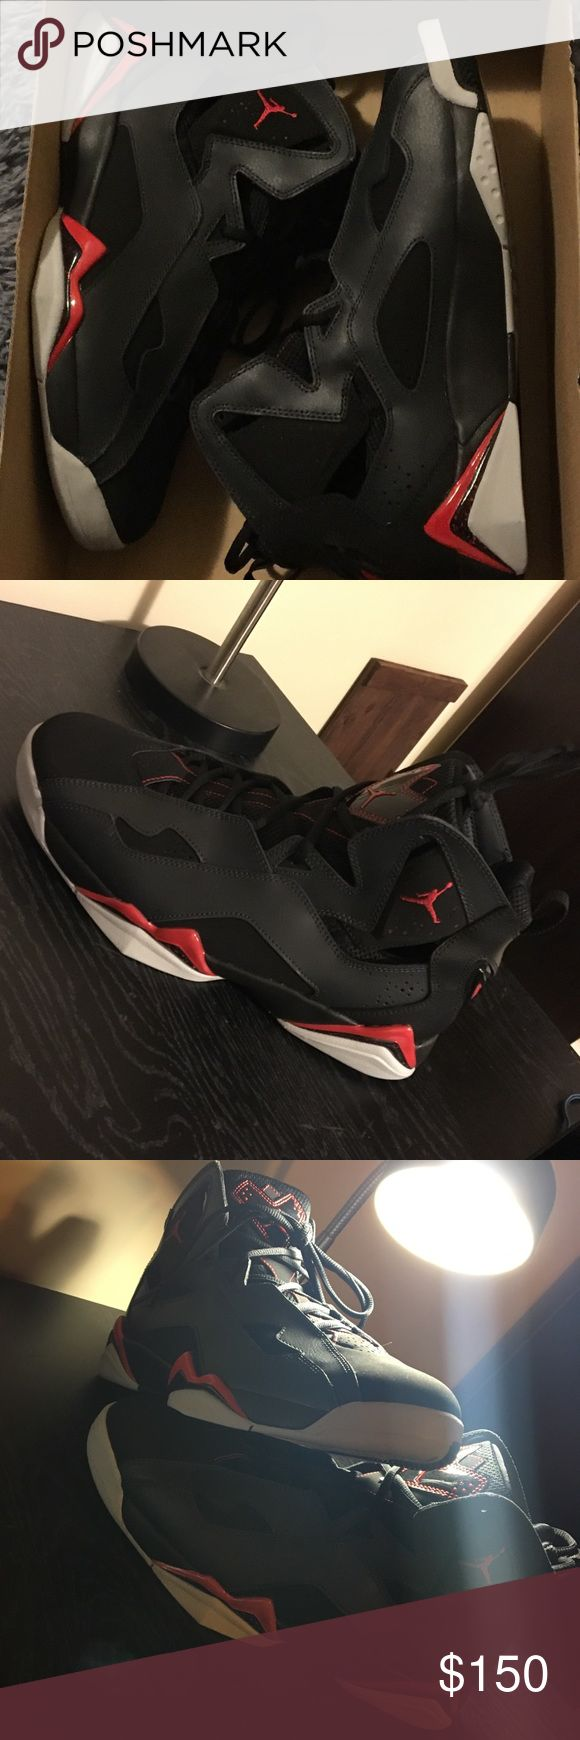 Jordan True Flight Brand new. Jordan Shoes Sneakers